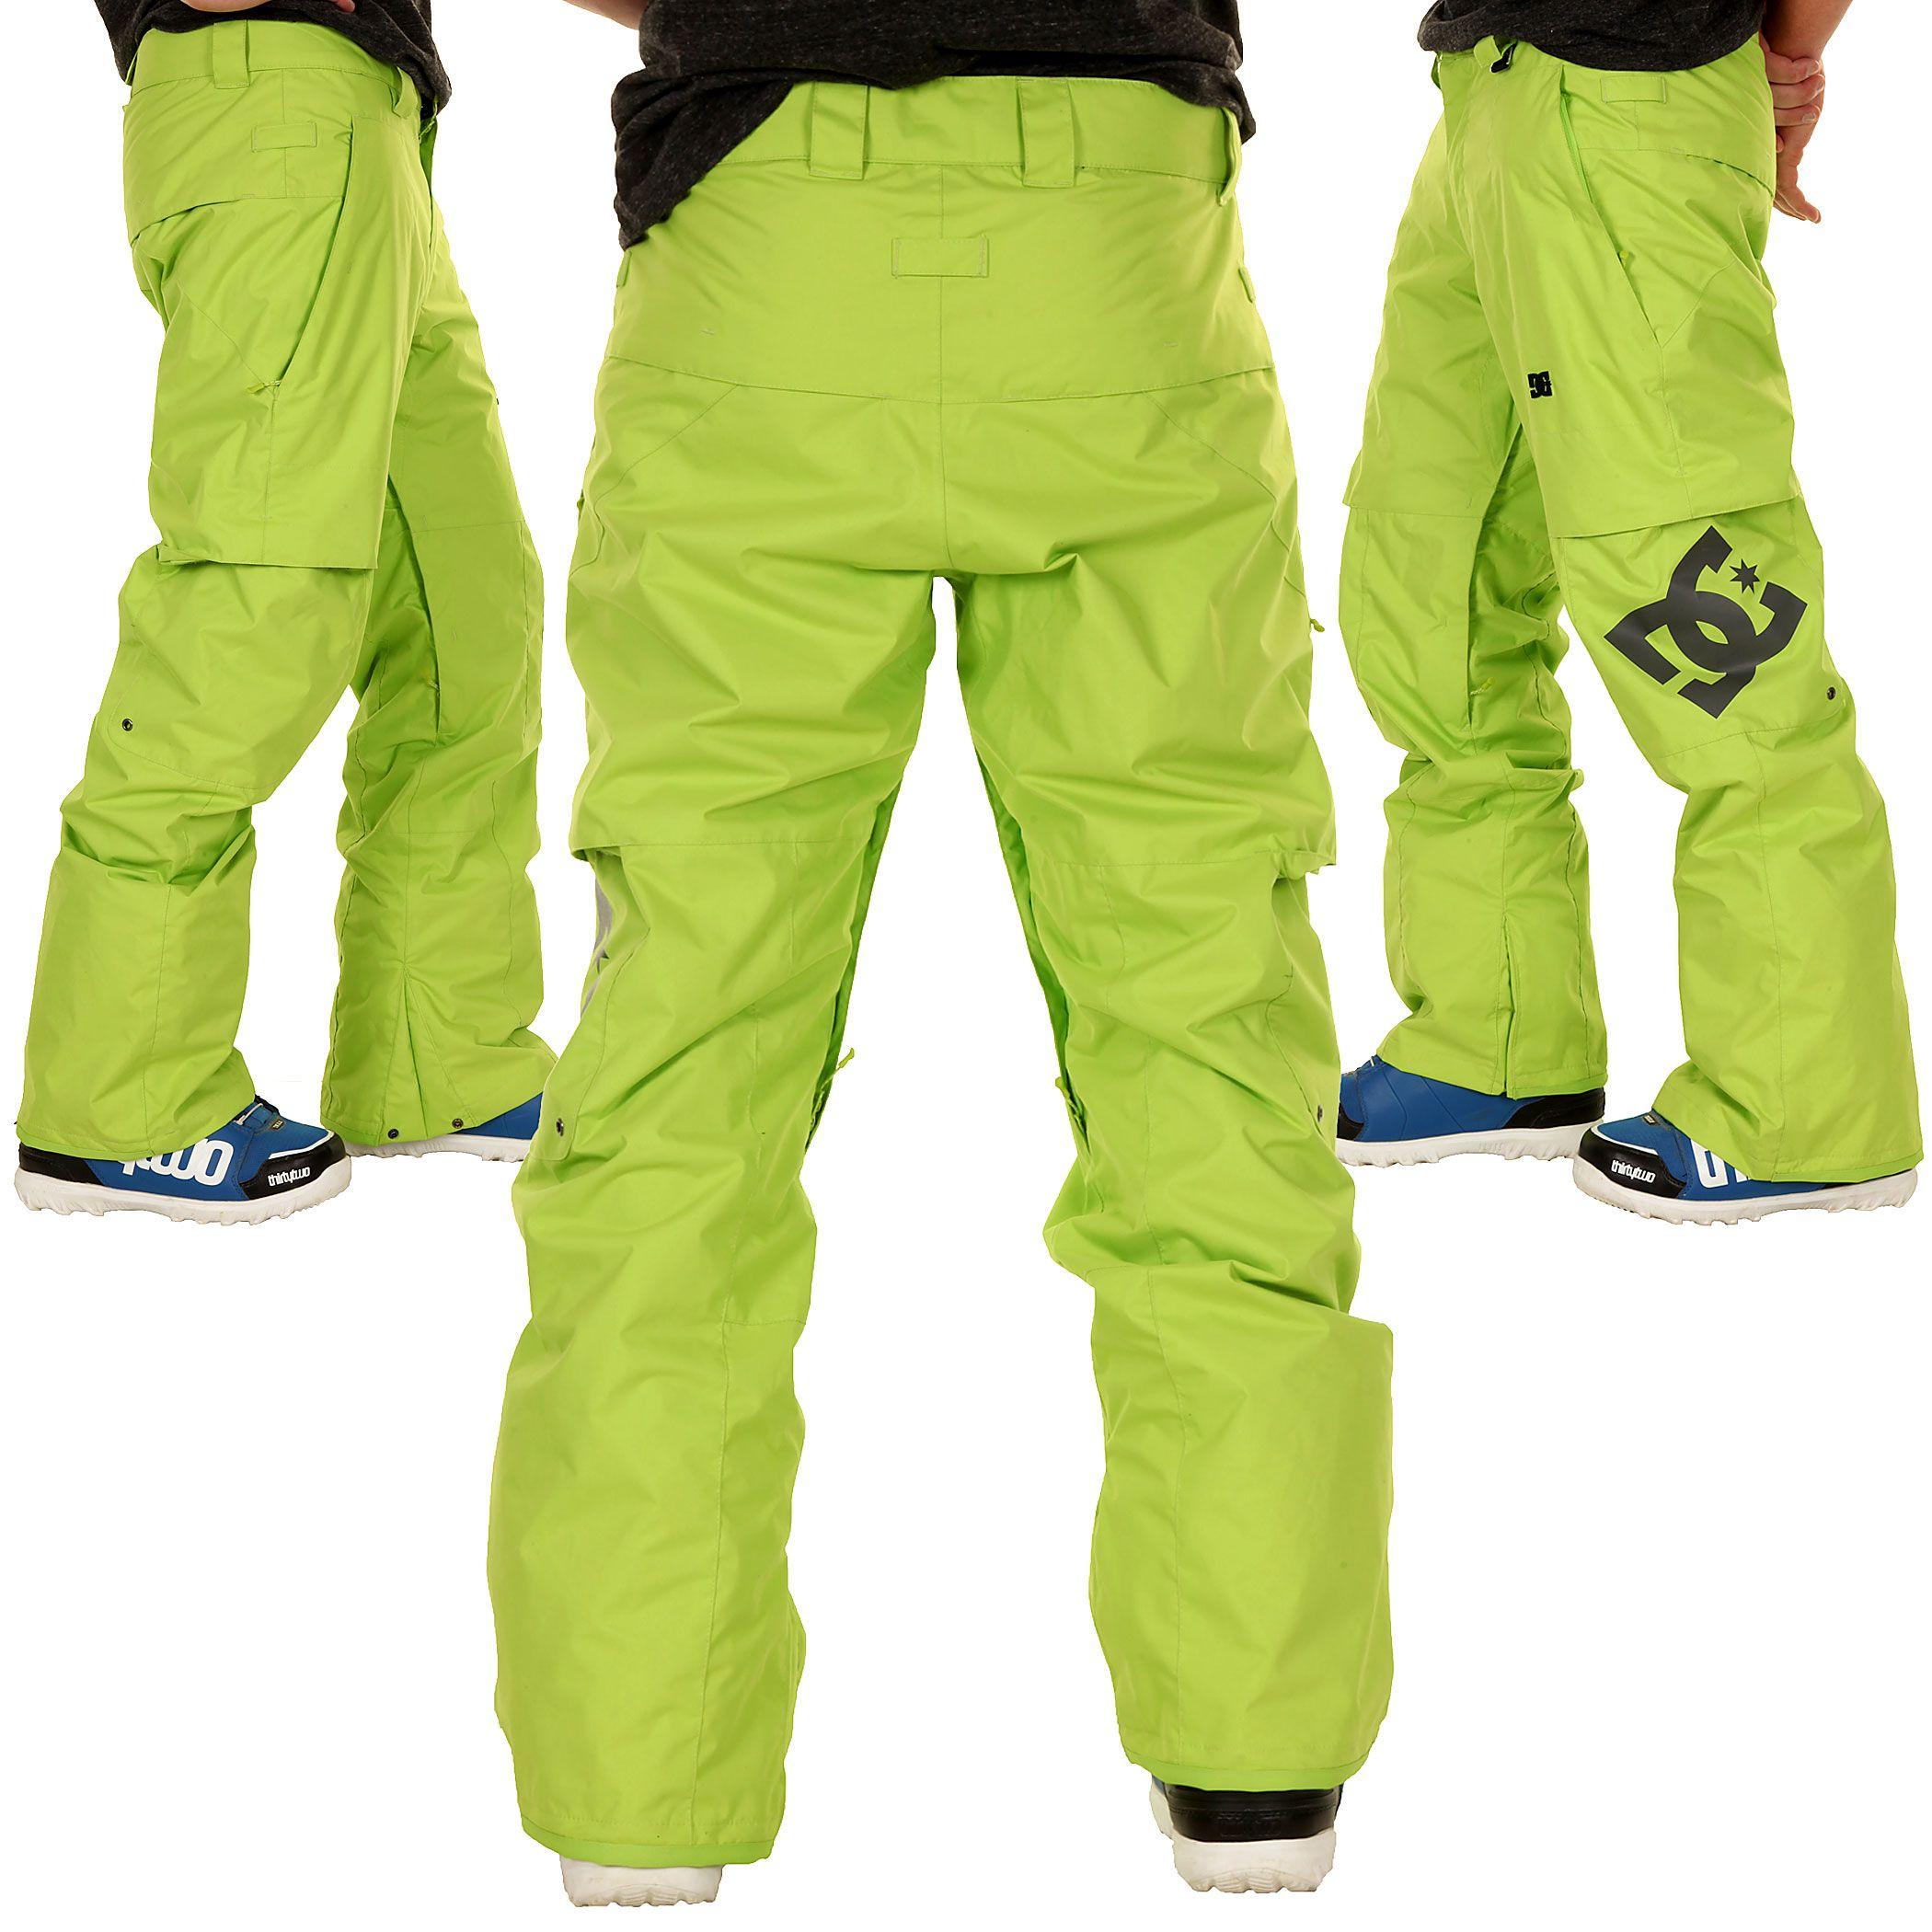 DC Banshee Snowboard Hose (lime green) kaufen bei skatedeluxe ...